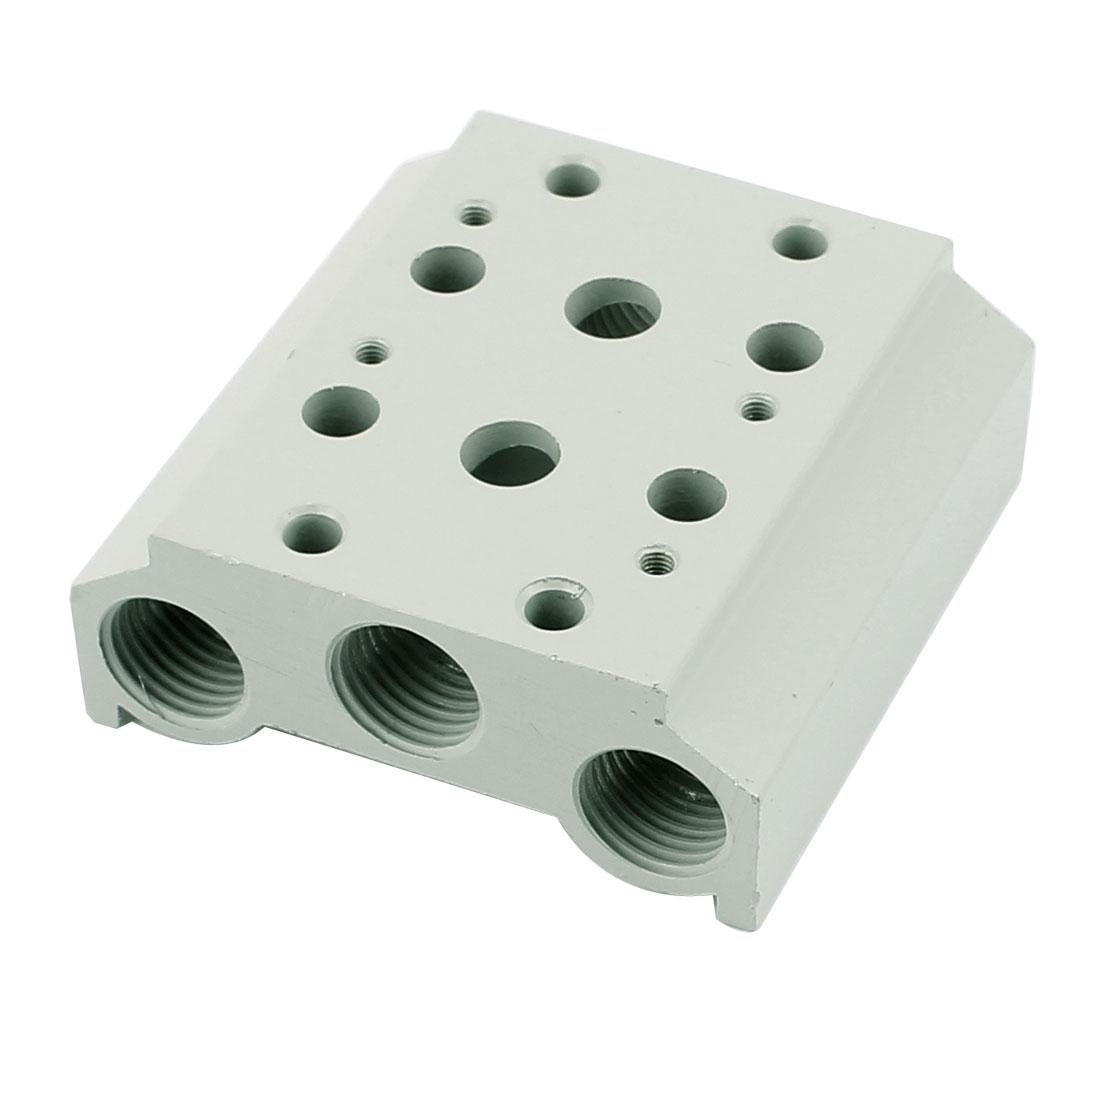 Pneumatic Control Aluminium Block Manifold Solenoid Valve Base 100M 2 Stations